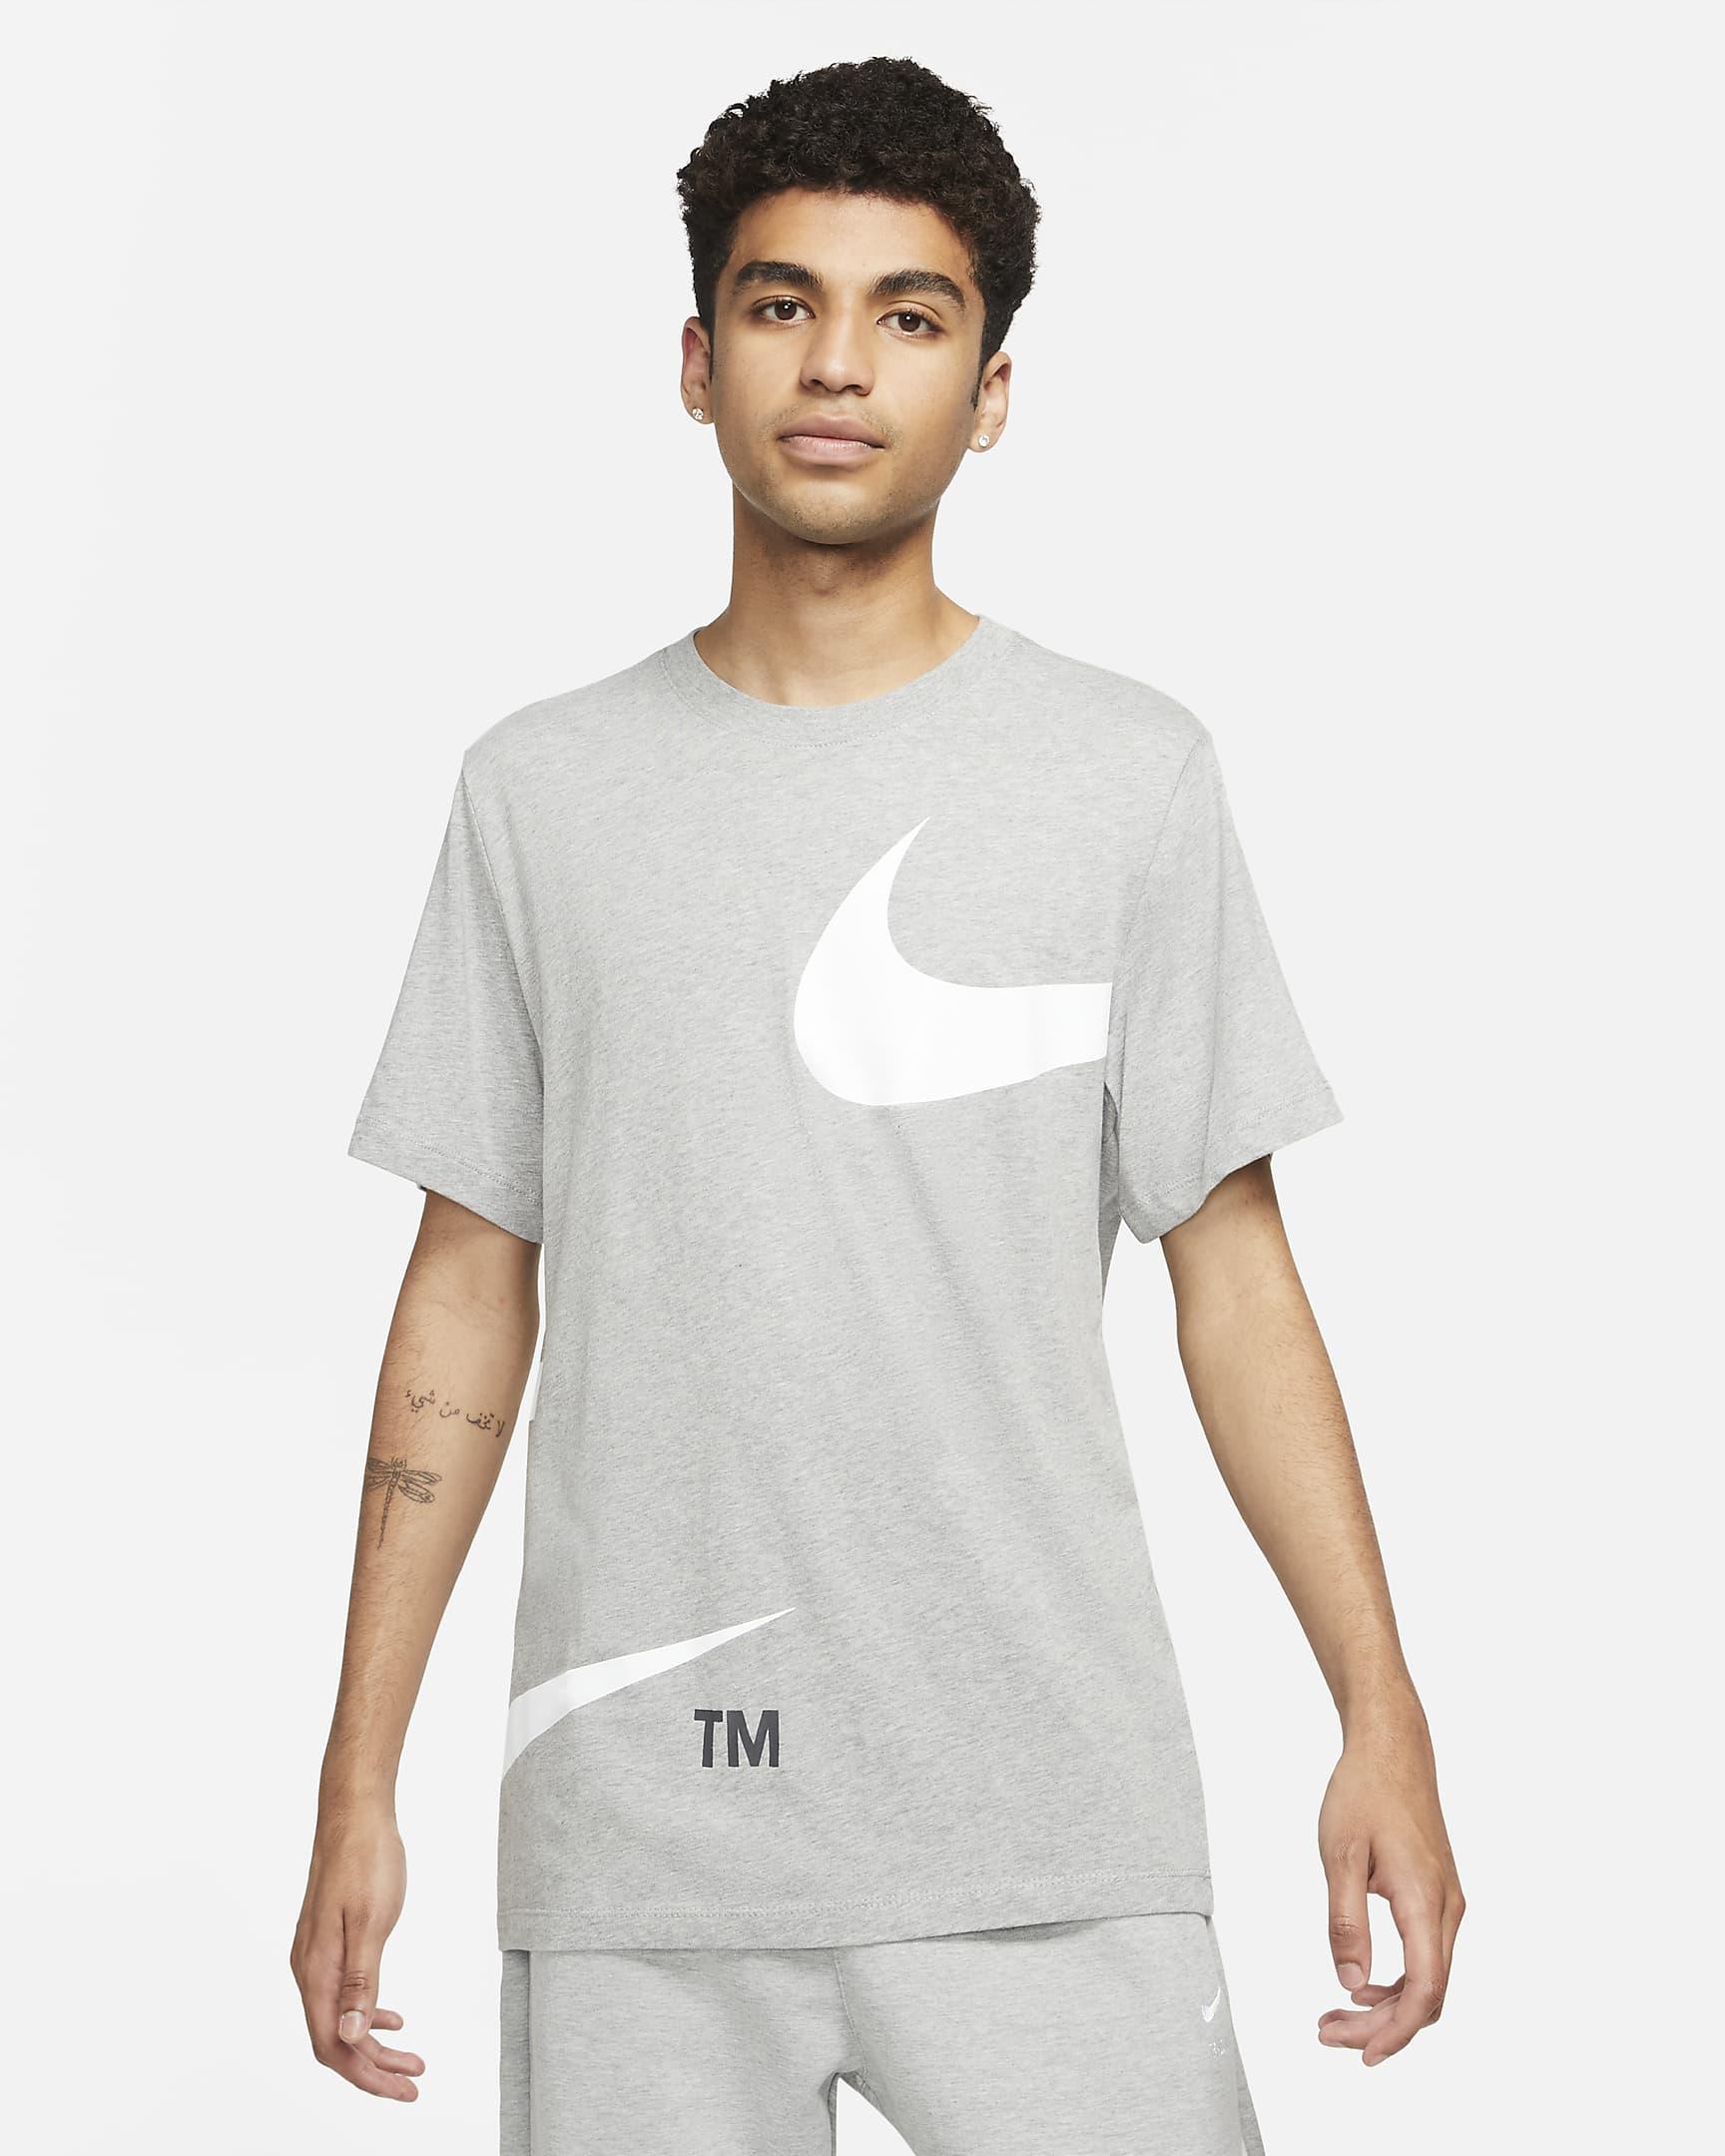 nike-sportswear-mens-t-shirt-zTB7SW.png